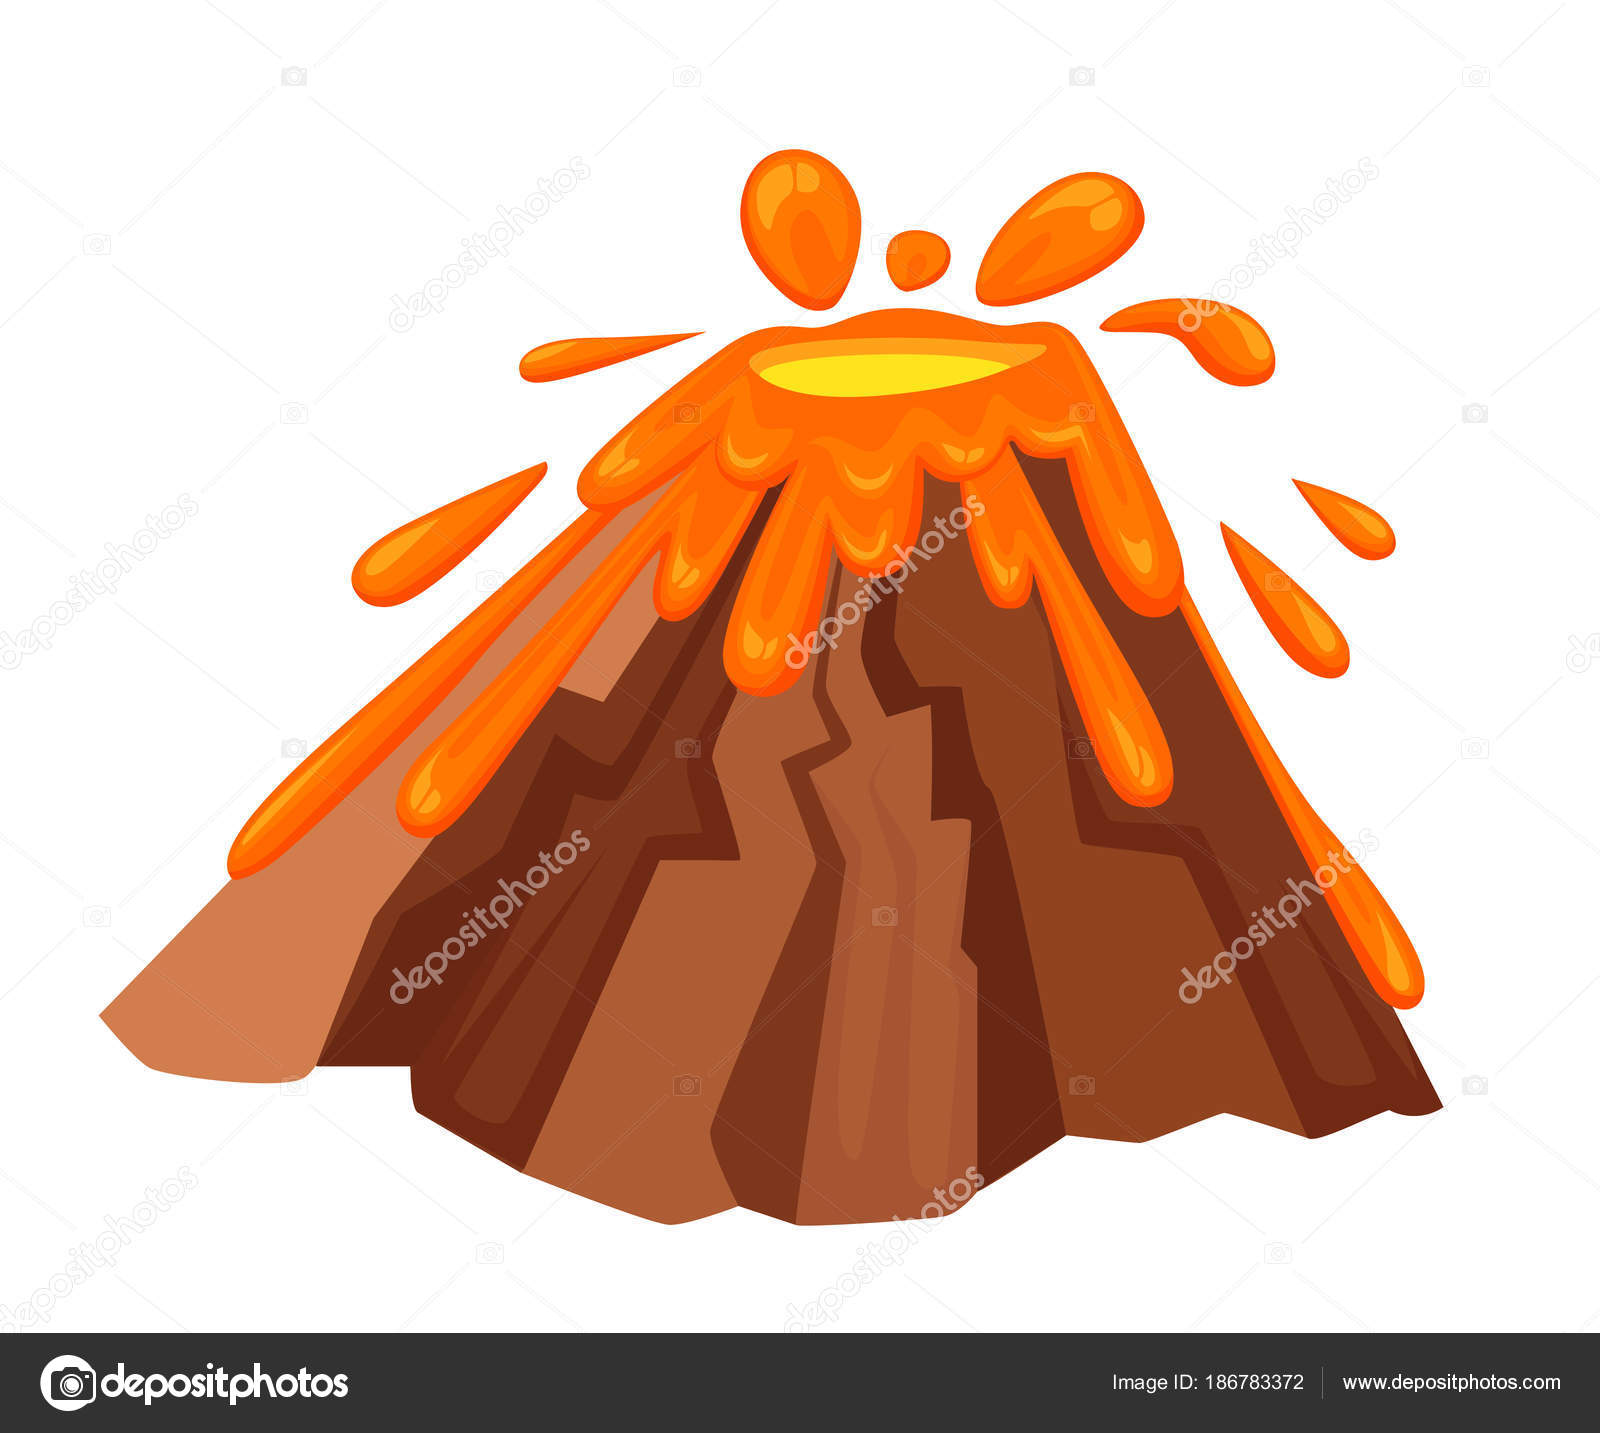 Erupción de volcán con ilustración lava caliente